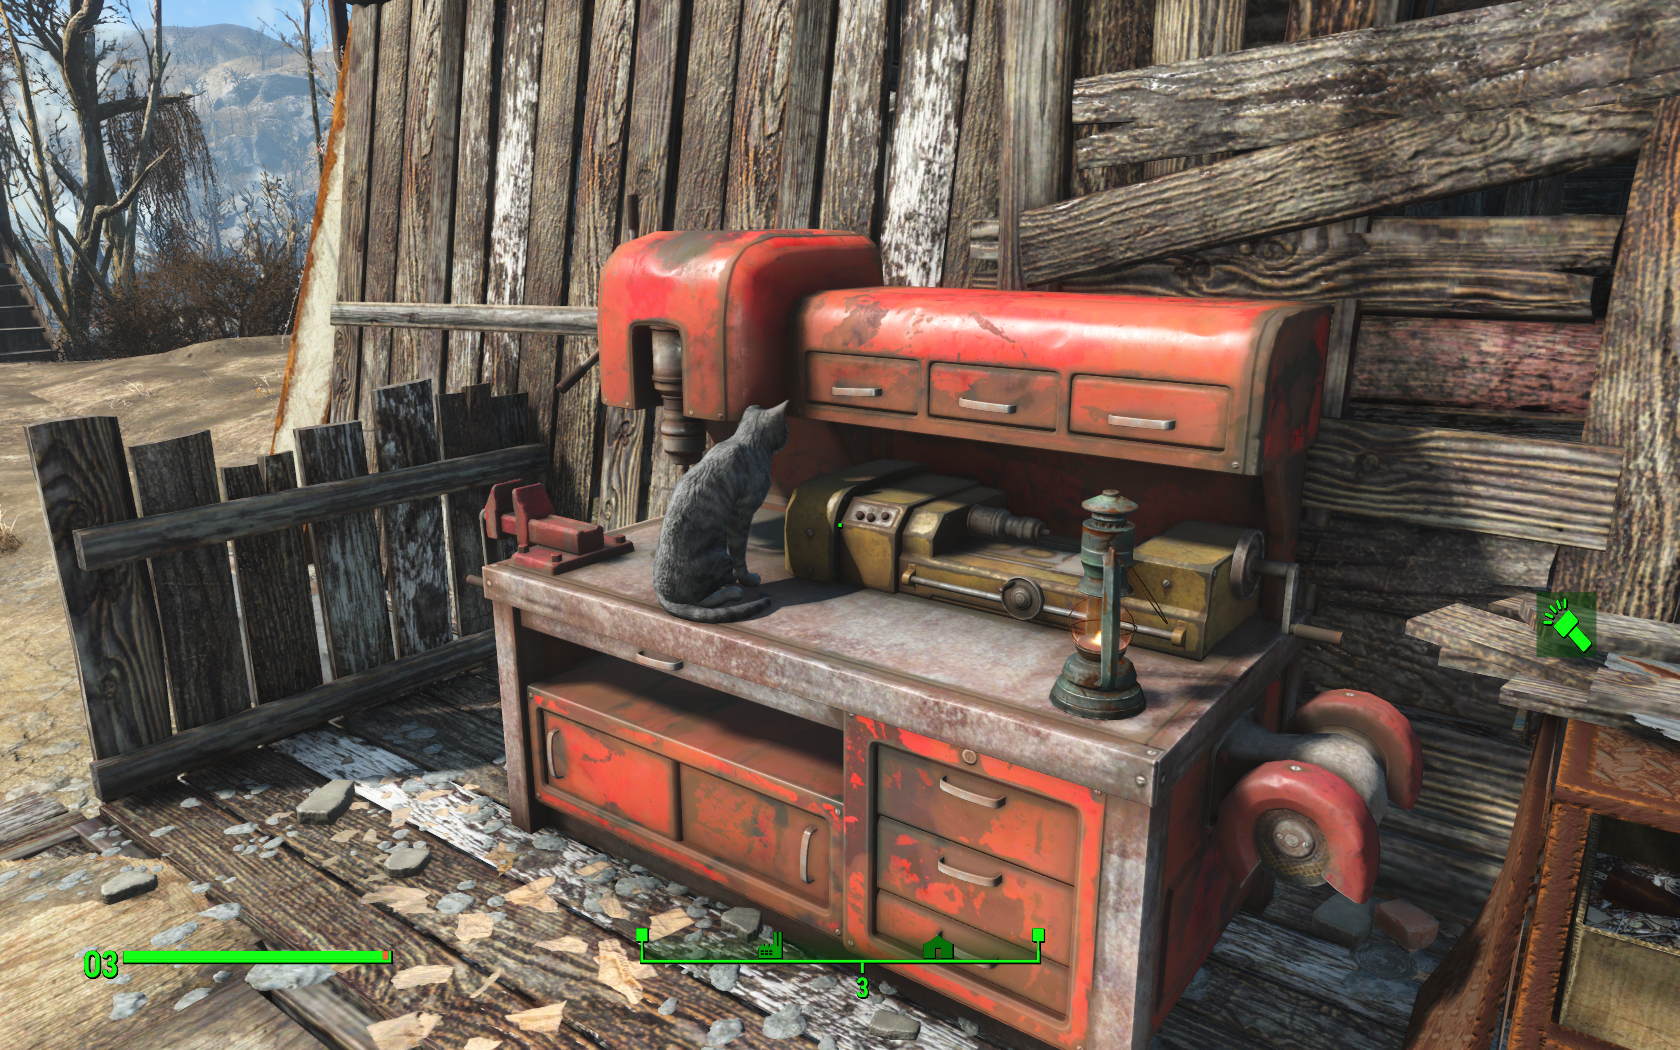 Киса на мастерской (Ферма Эбернети) - Fallout 4 Кошка, Ферма, Эбернети